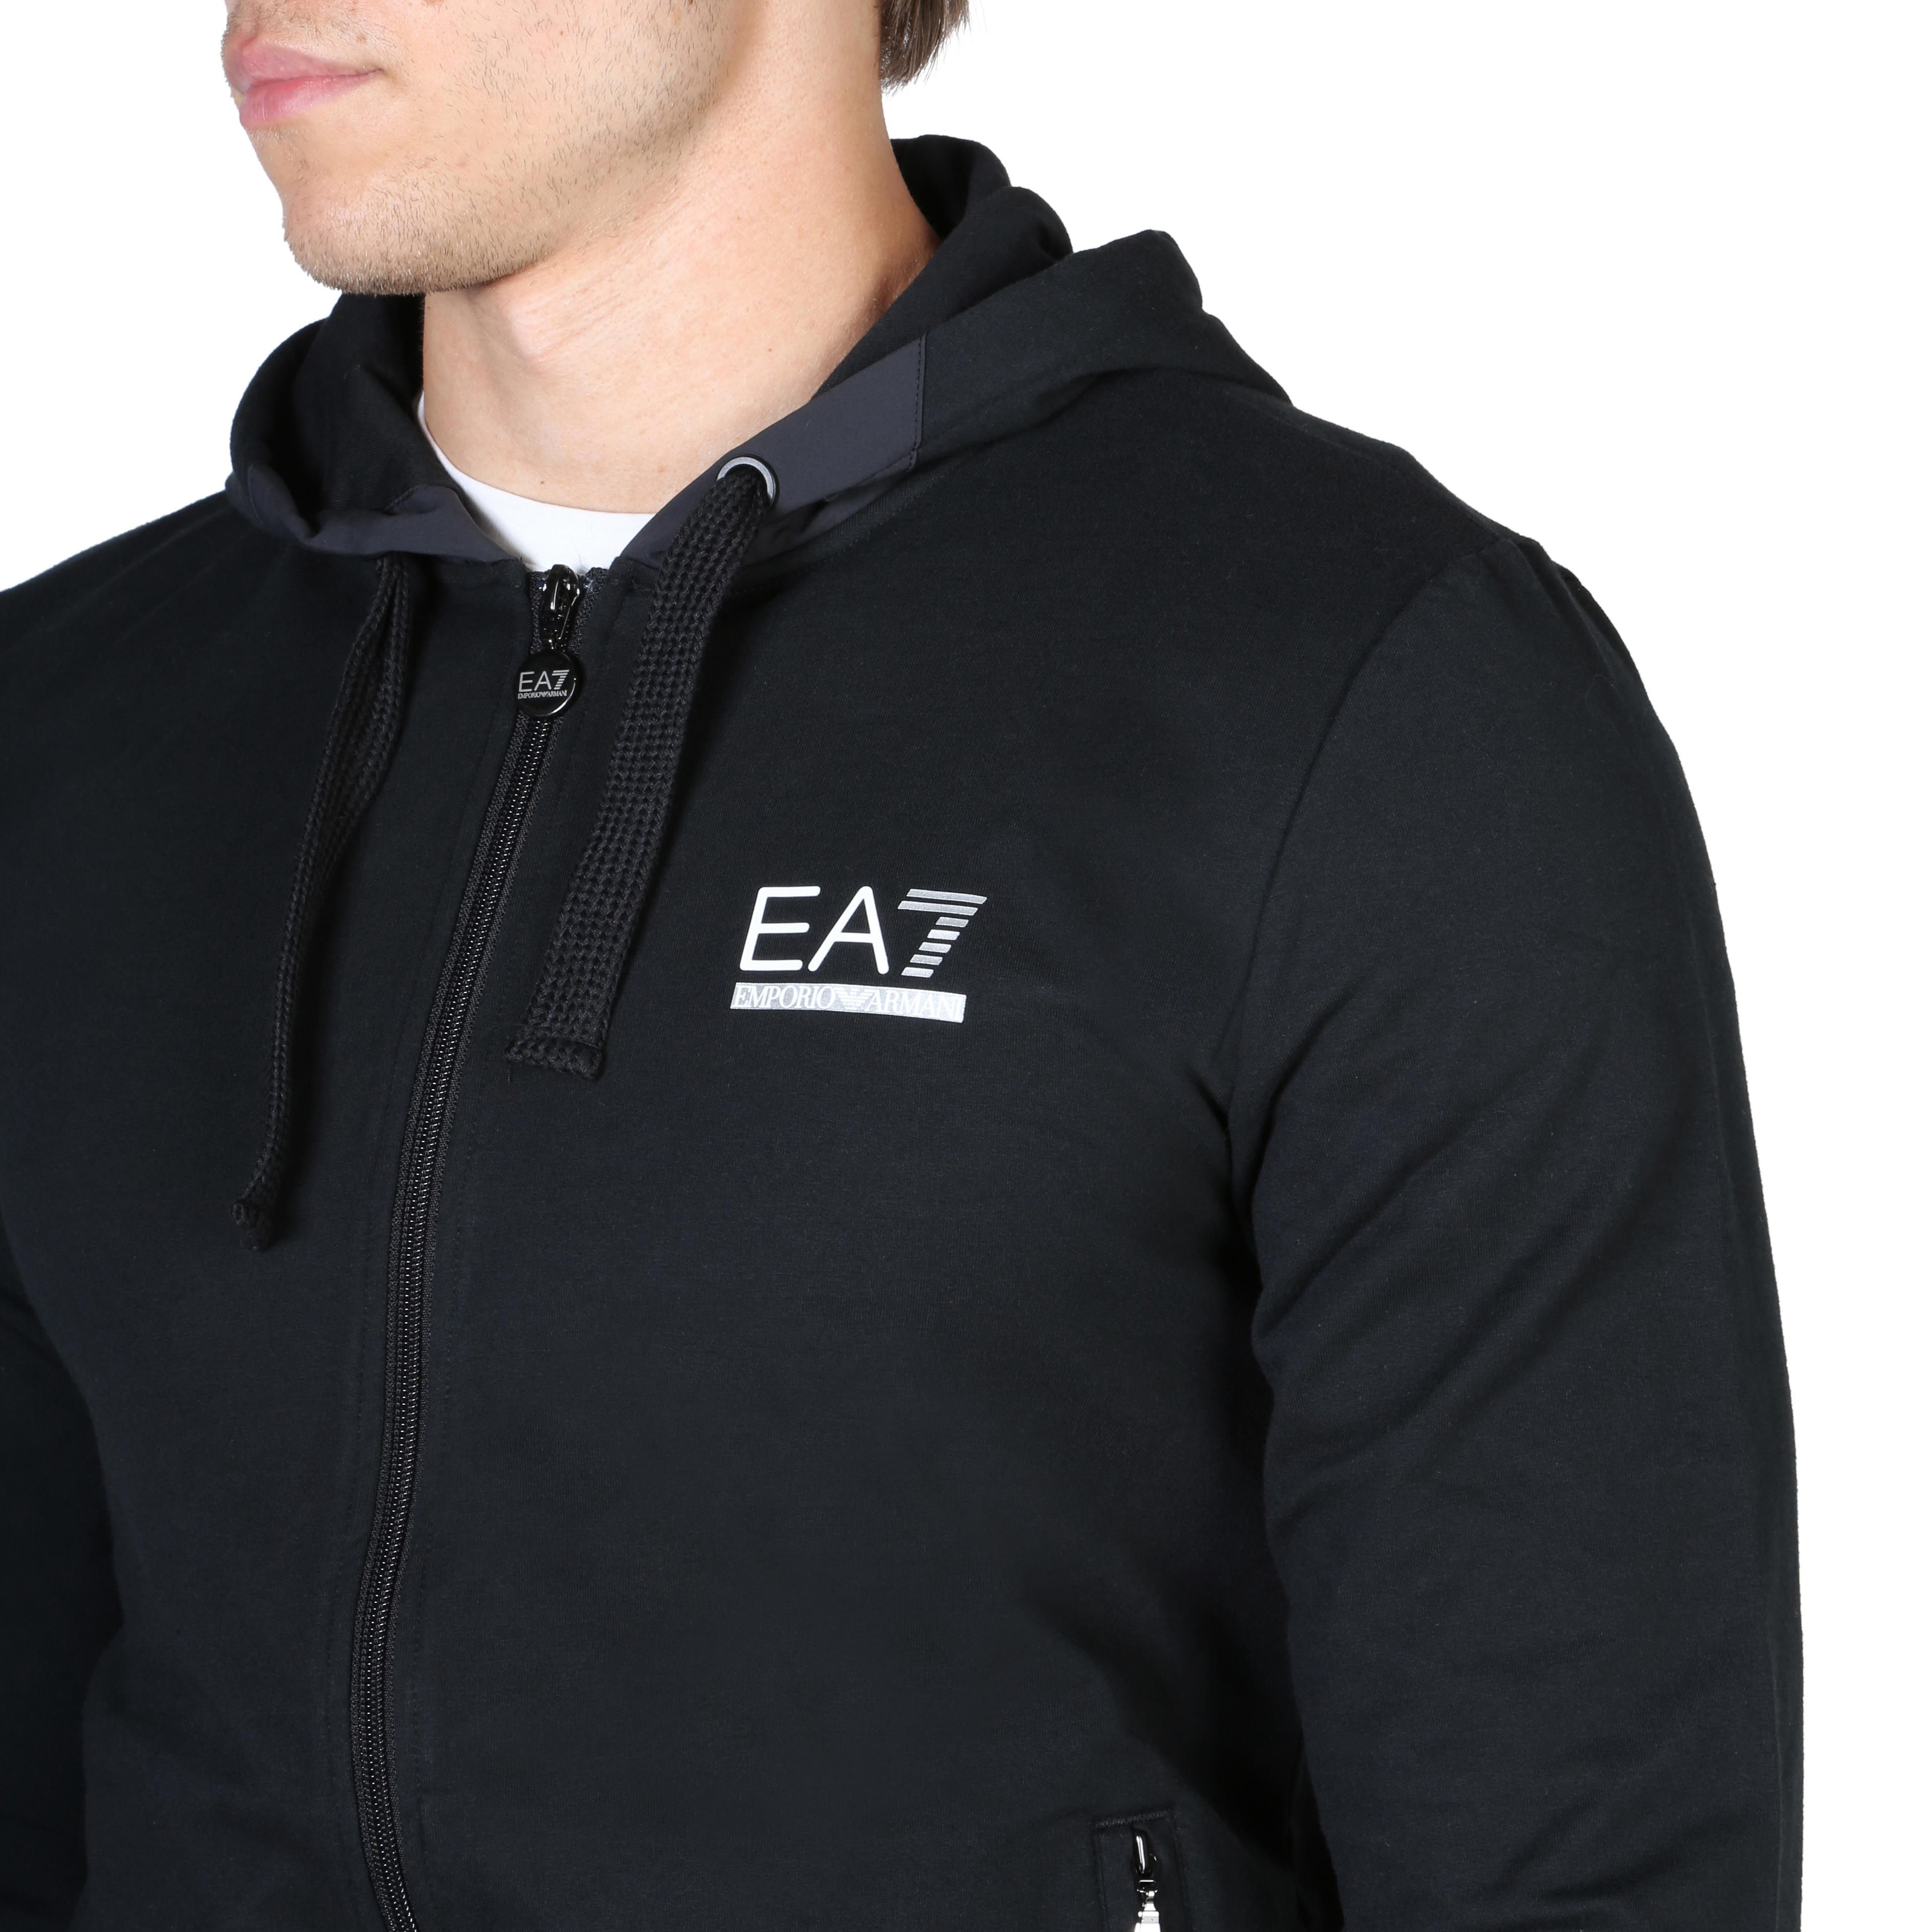 Bekleidung EA7 – 274706_6P227 – Schwarz